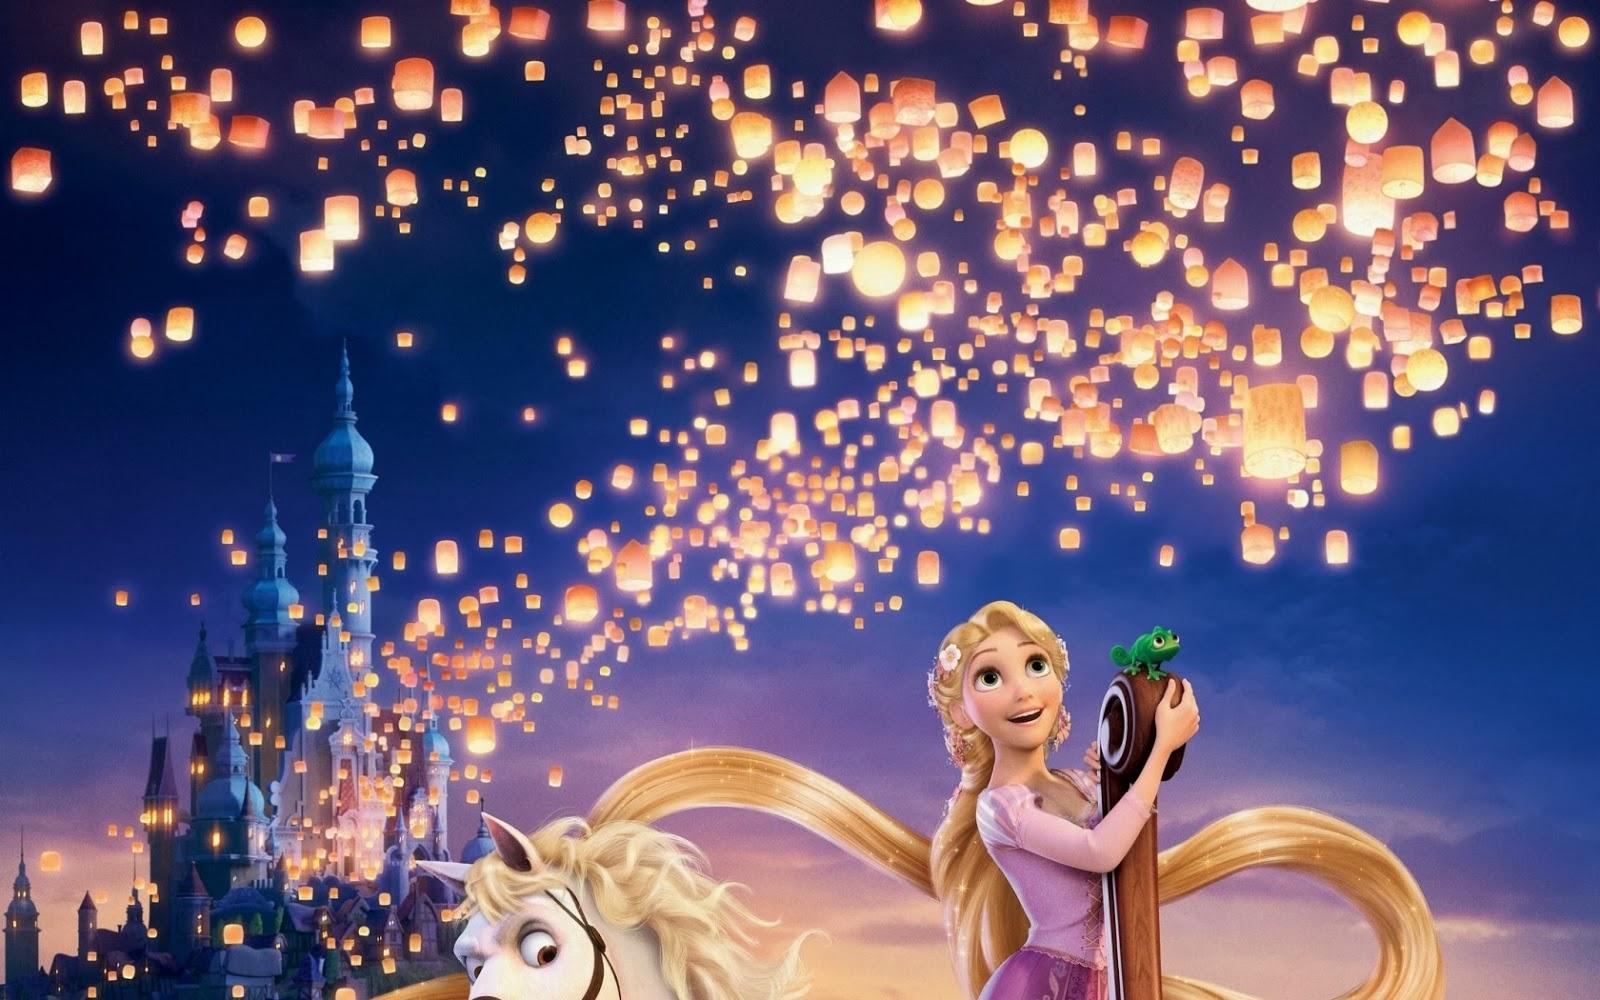 Tangled Rapunzel HD Wallpapers Download HD WALLPAERS 4U FREE 1600x1000